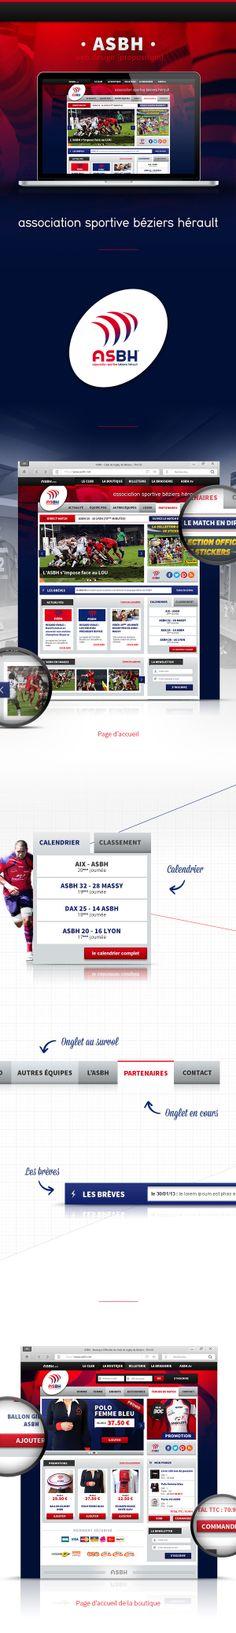 ASBH - Club Rugby Pro - Web design by Ramos Jerome, via Behance Proposition, Rugby, Web Design, Behance, Club, Mockup, Athlete, Design Web, Website Designs